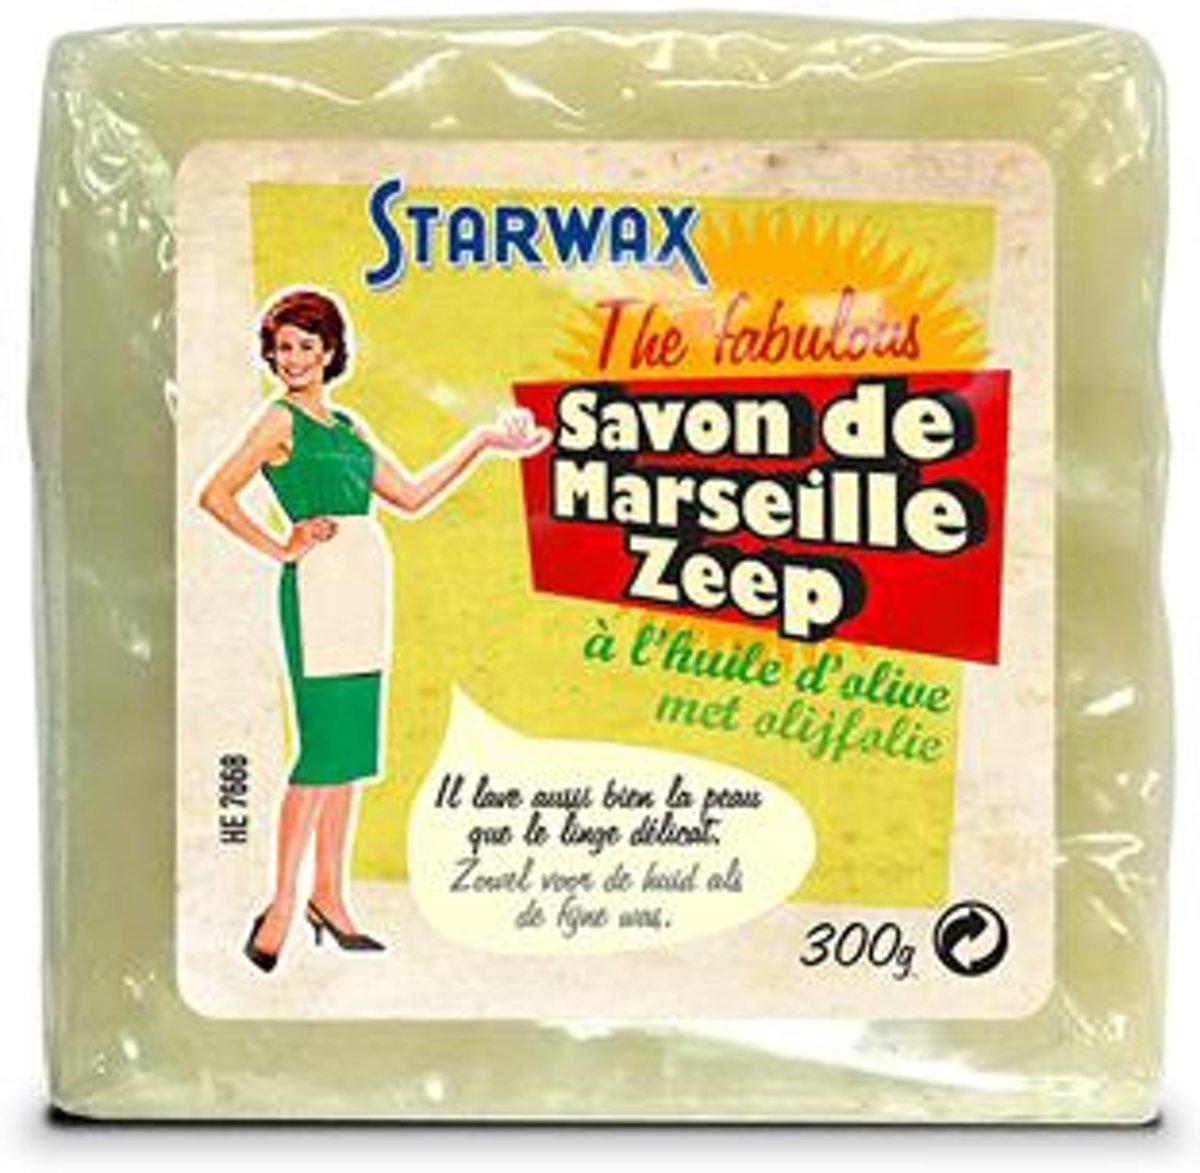 Starwax zeep Marseille 'The Fabulous' 300 gr kopen